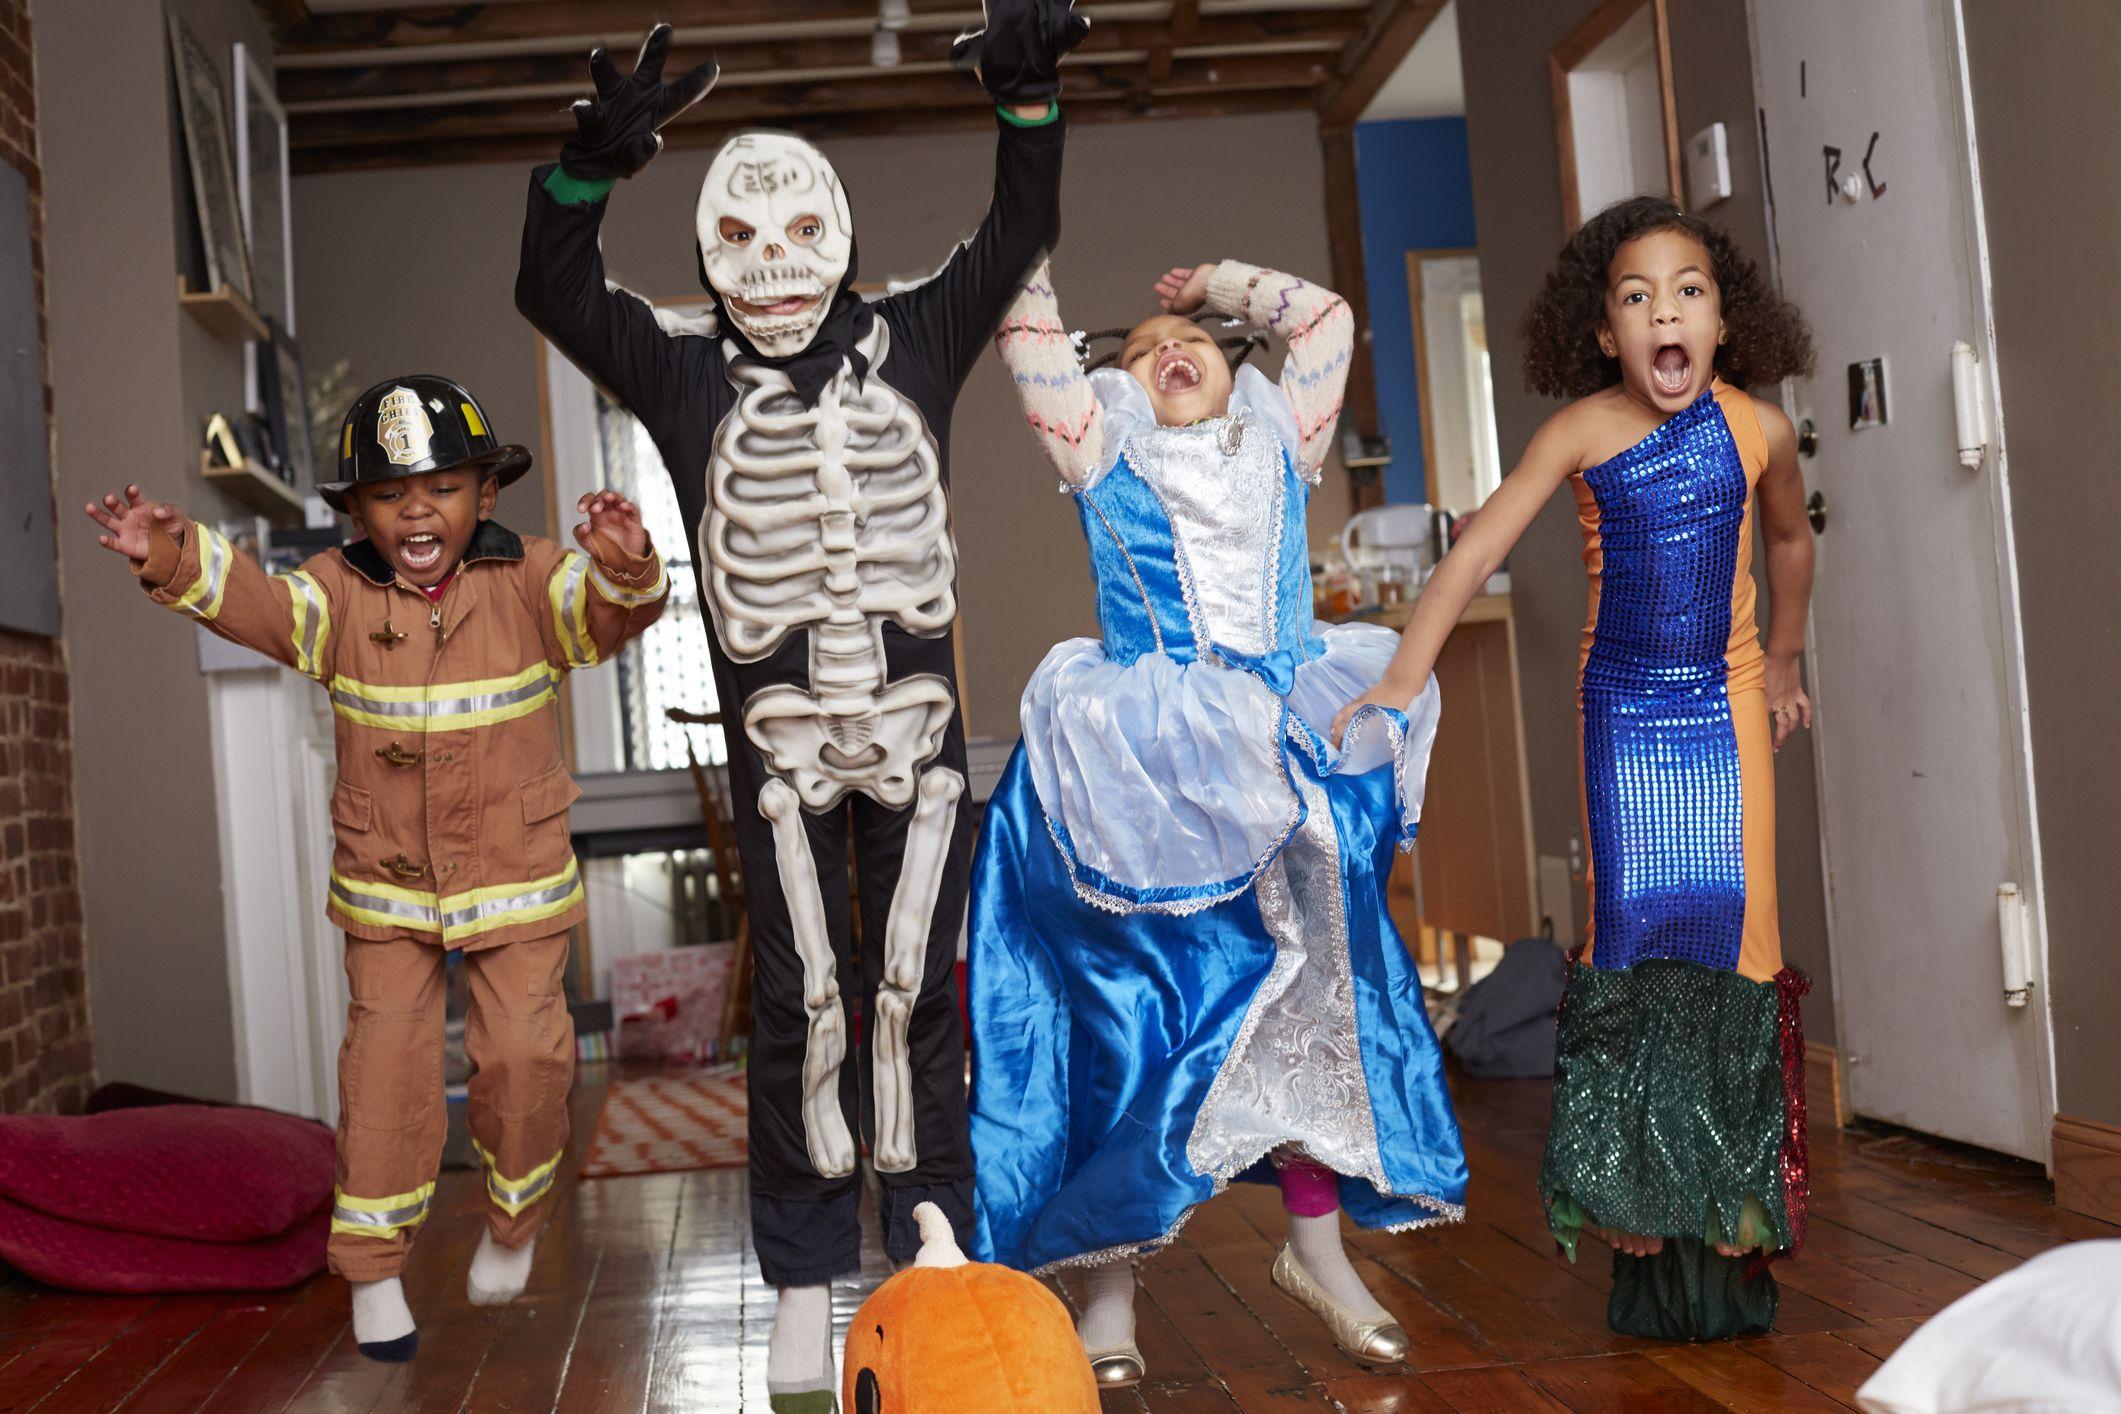 Halloween Kids.Best Halloween Songs For Kids Family Friendly Spooky Songs